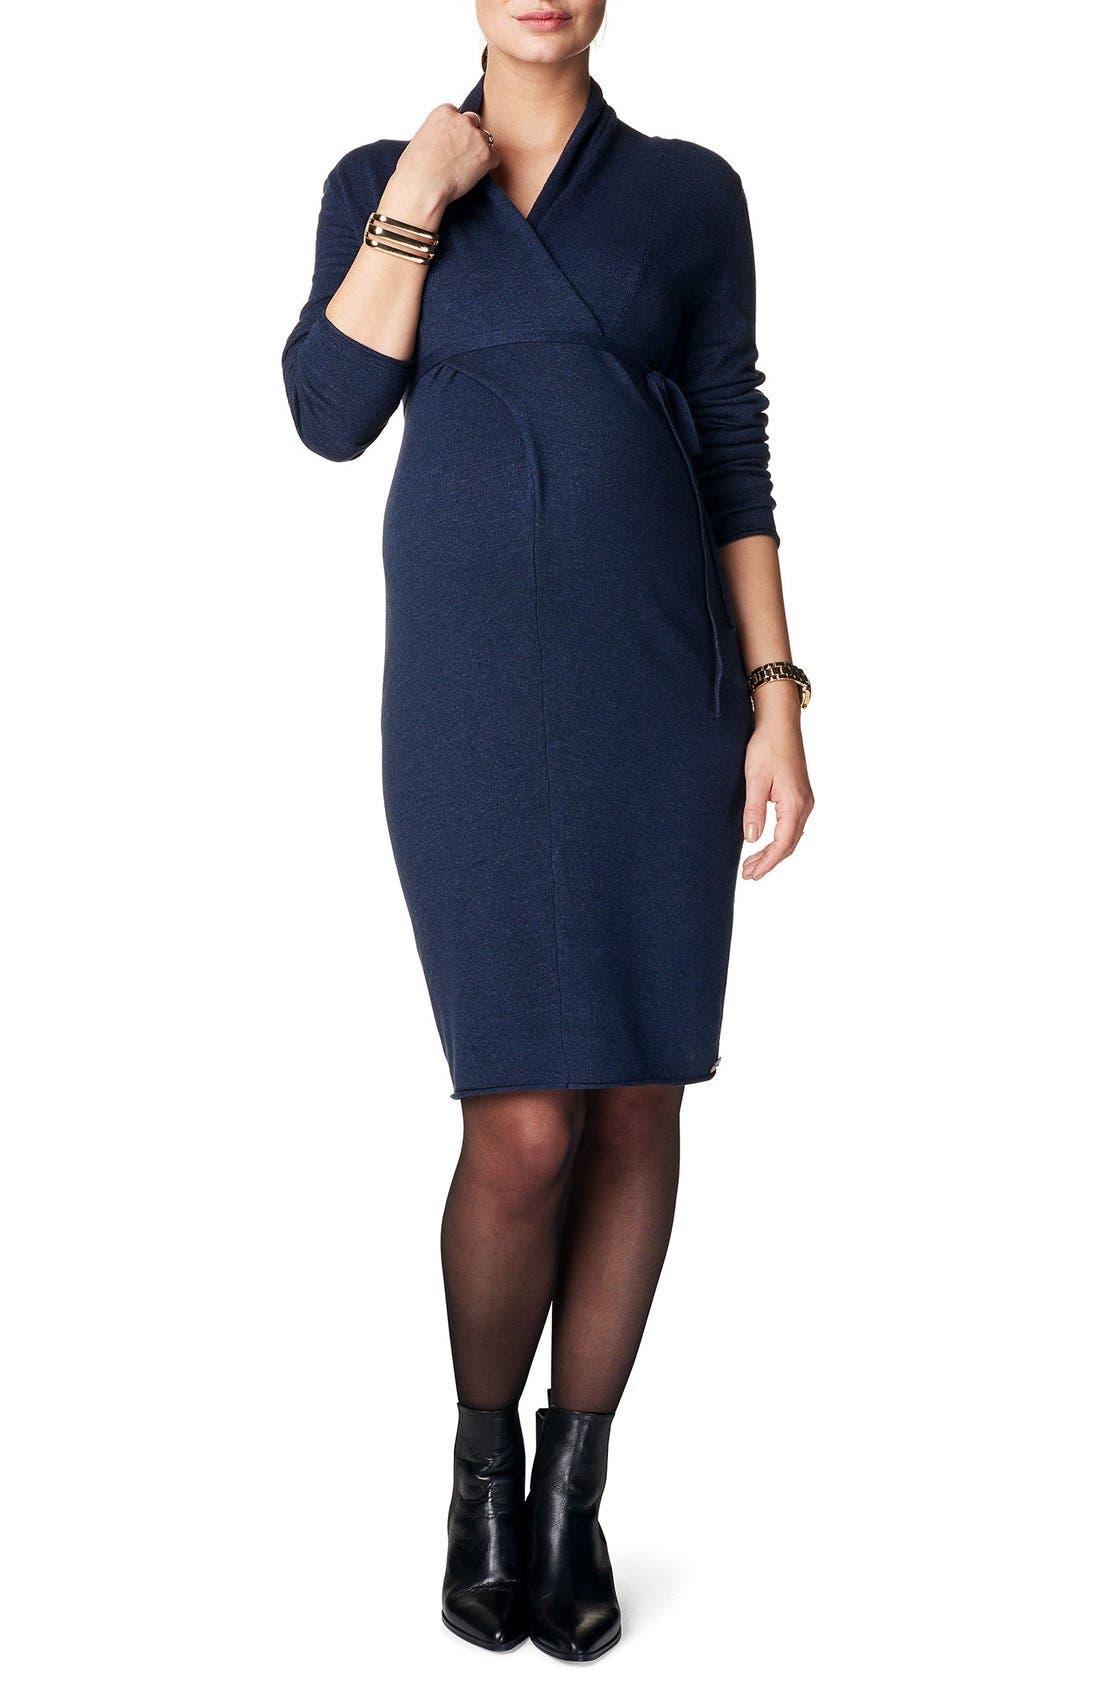 Zara Knit Maternity Sweater Dress,                             Main thumbnail 1, color,                             DARK BLUE